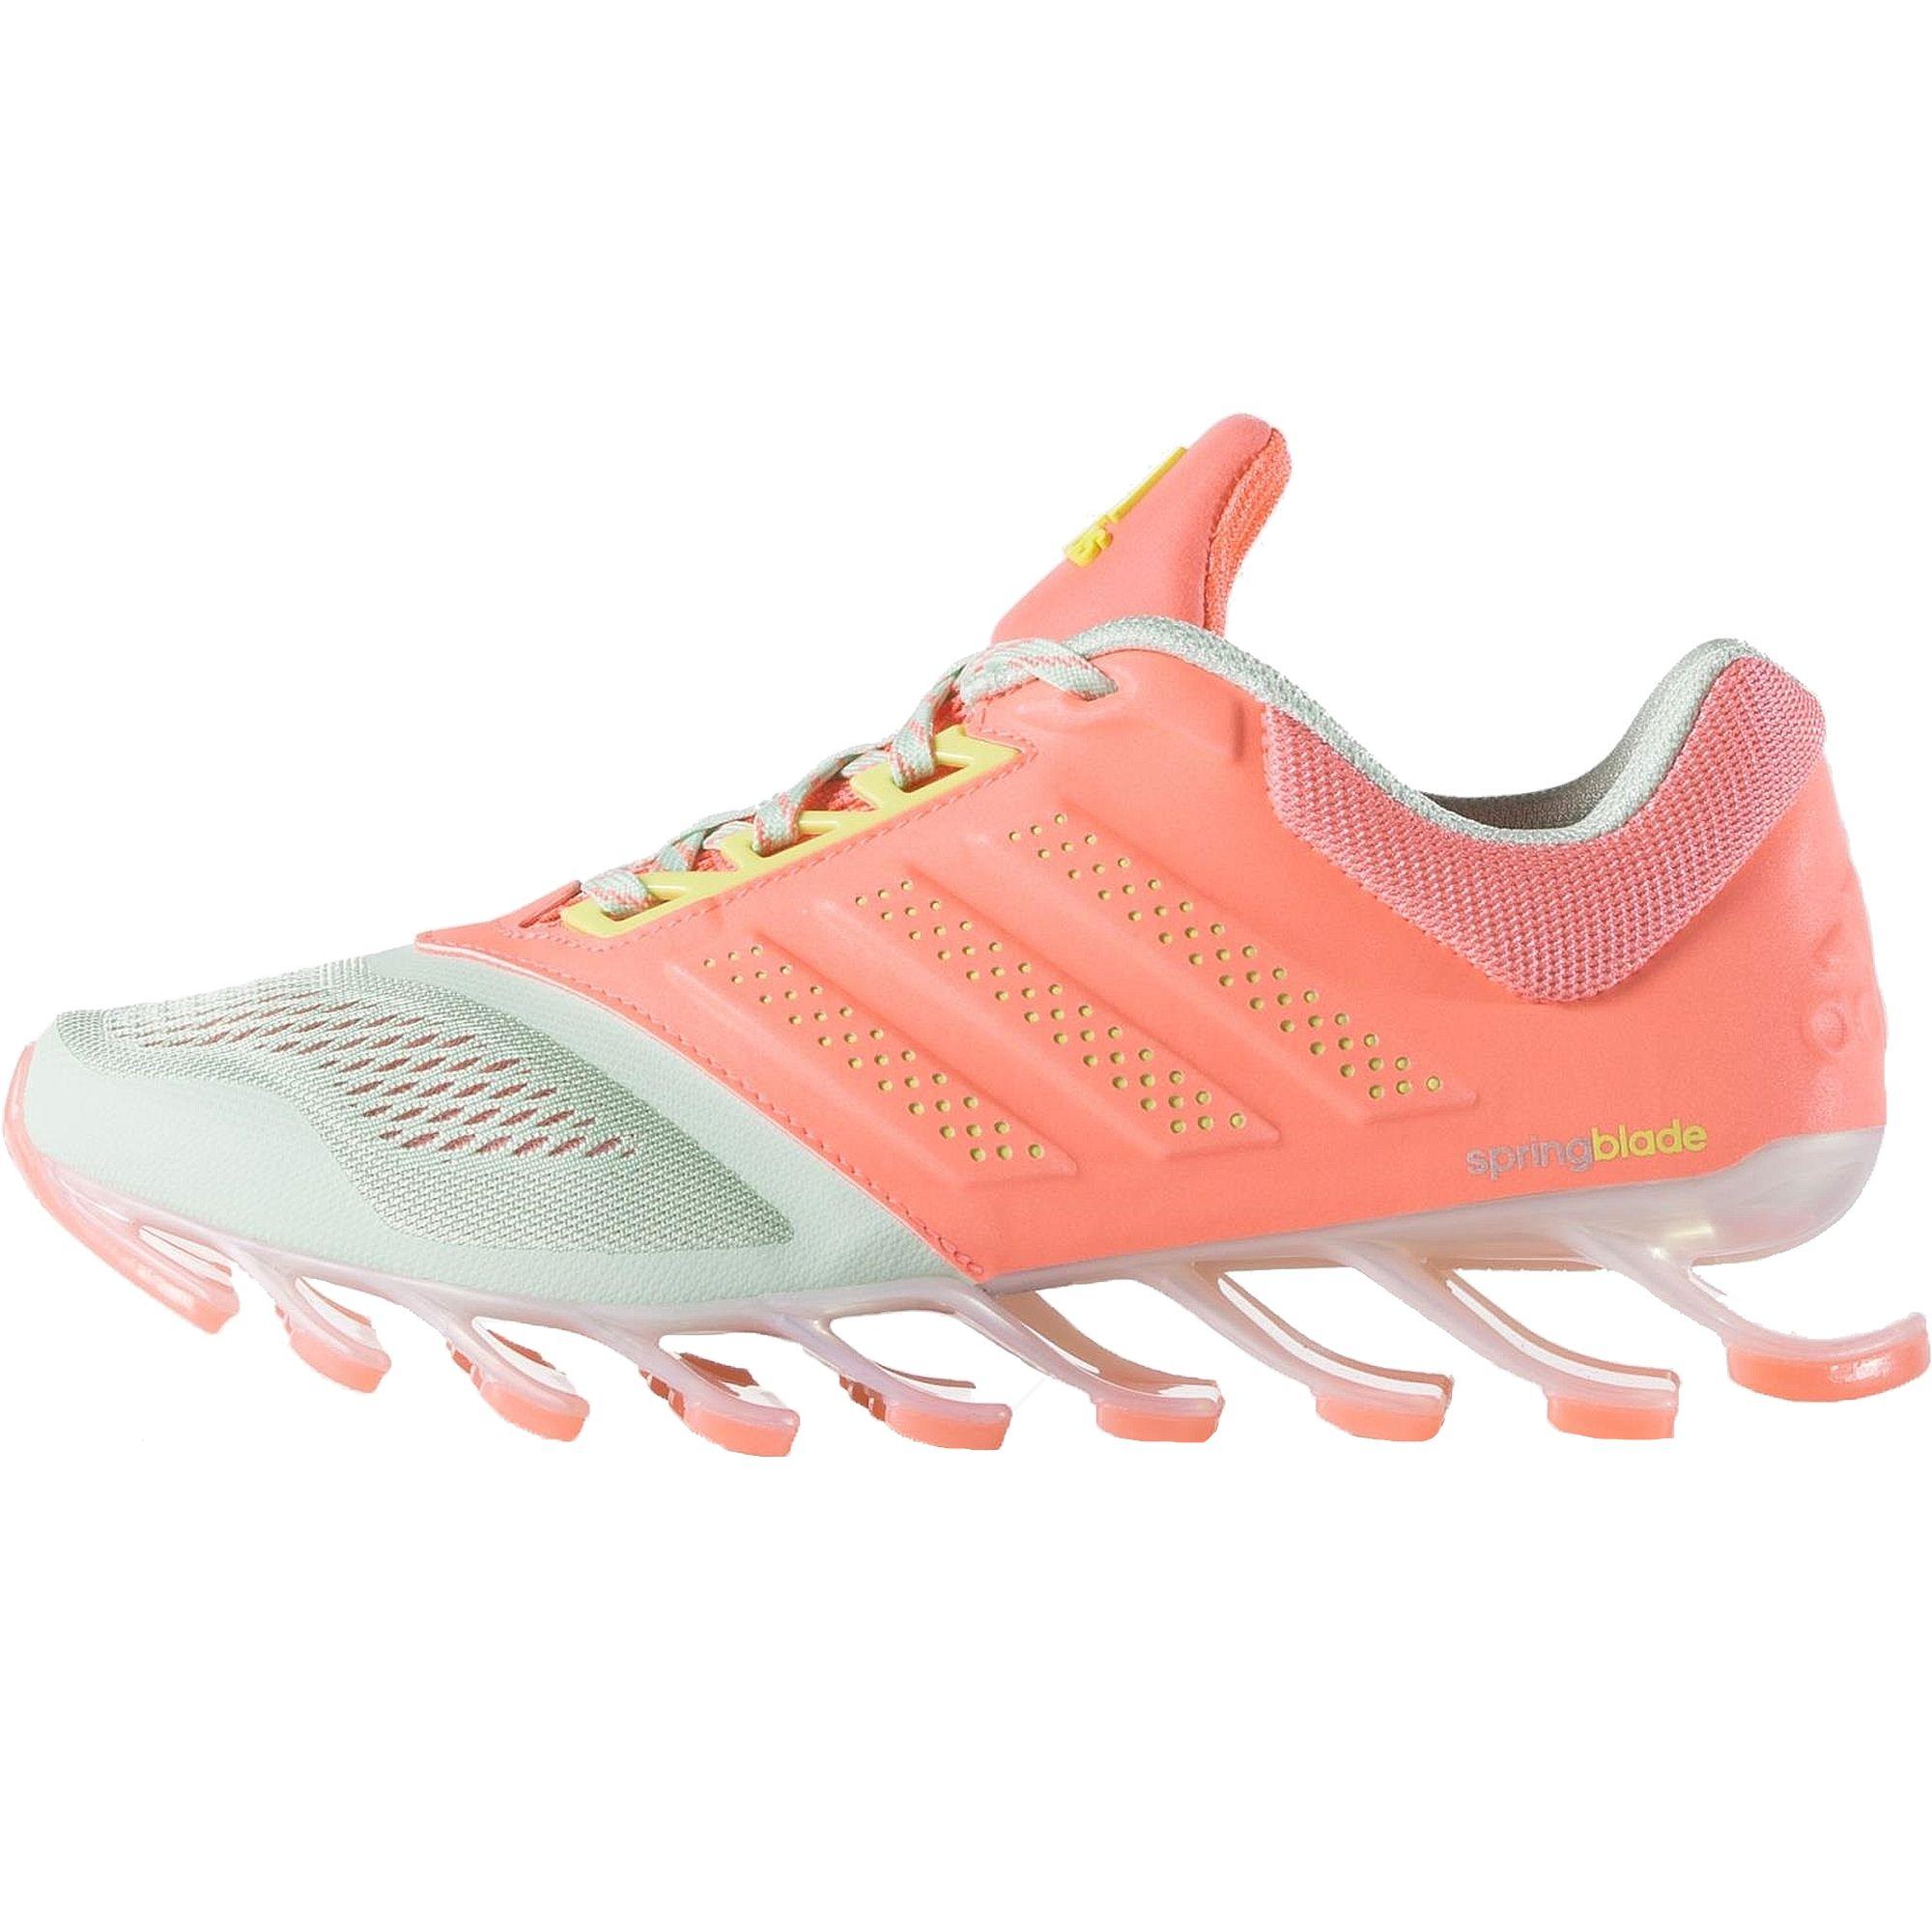 Adidas springblade Drive 2 Kadın spor ayakkab ı d70331